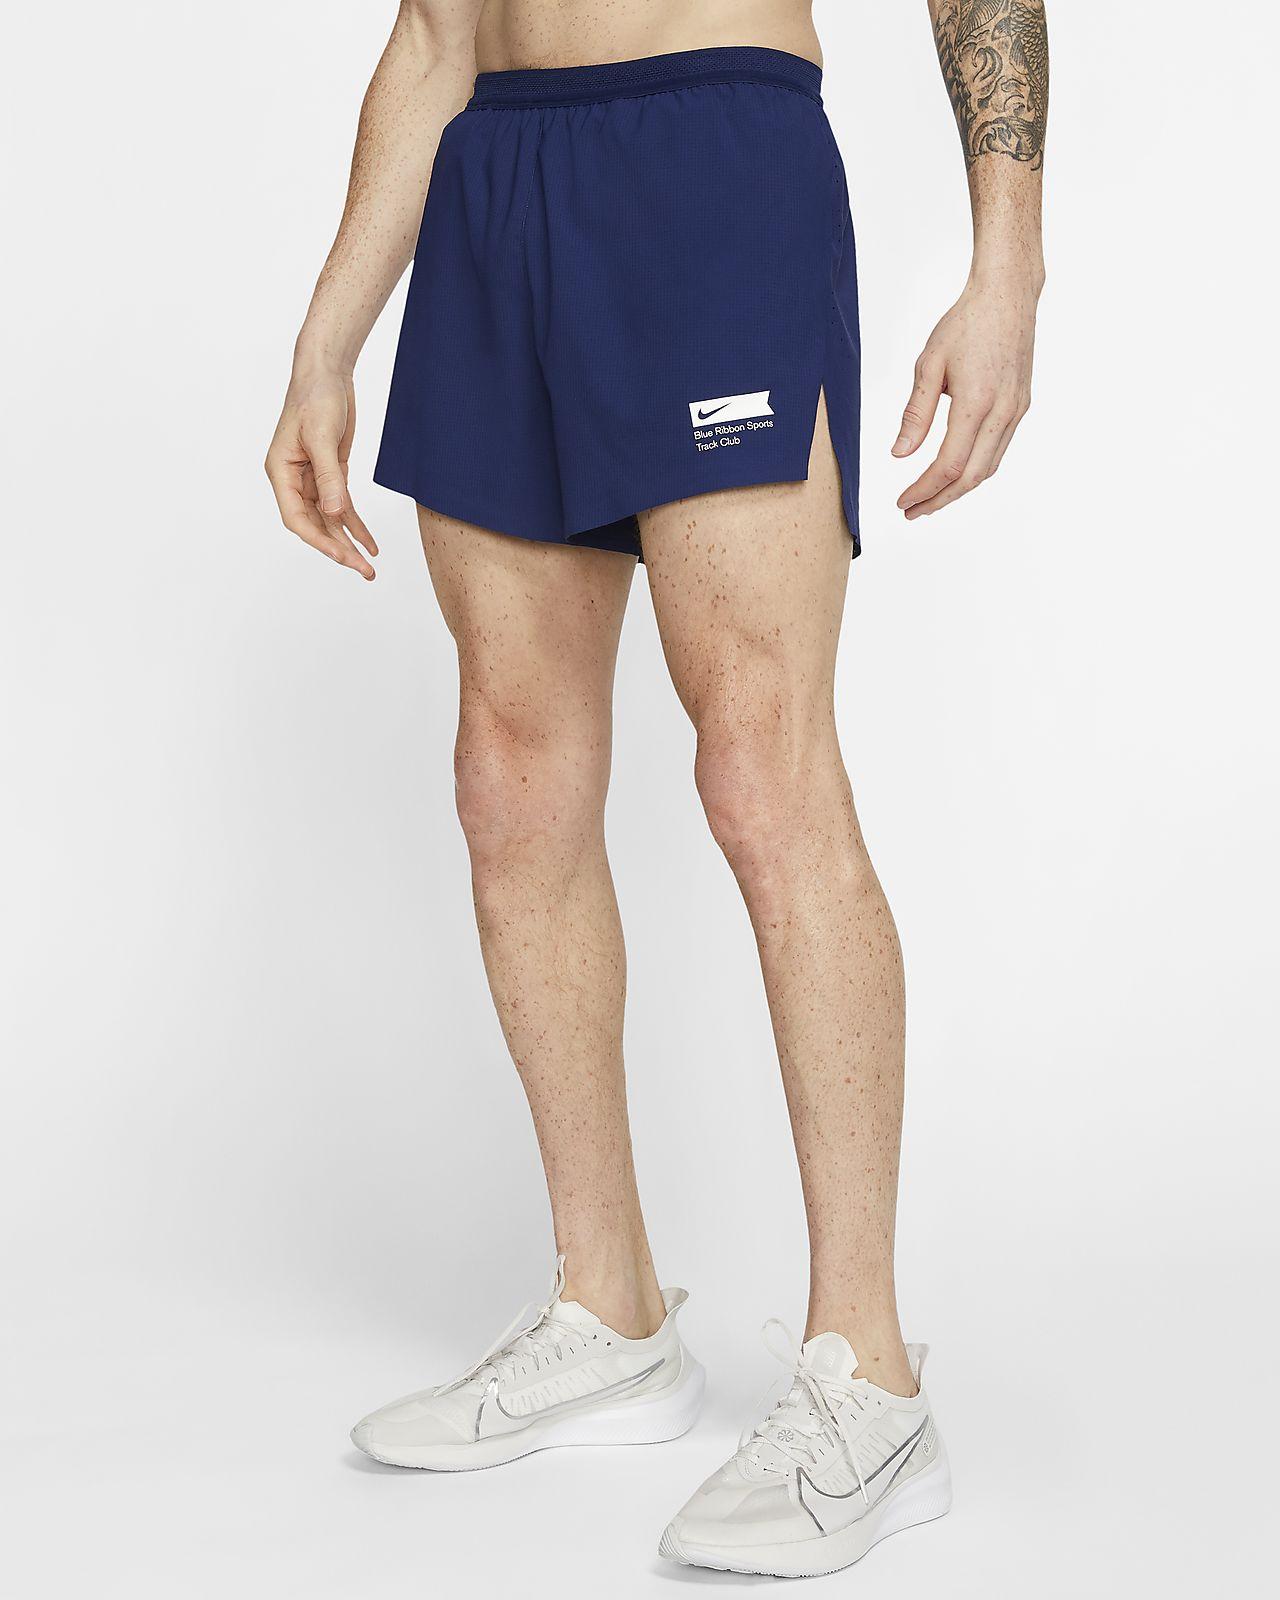 Short de running Nike AeroSwift Blue Ribbon Sports 11,5 cm